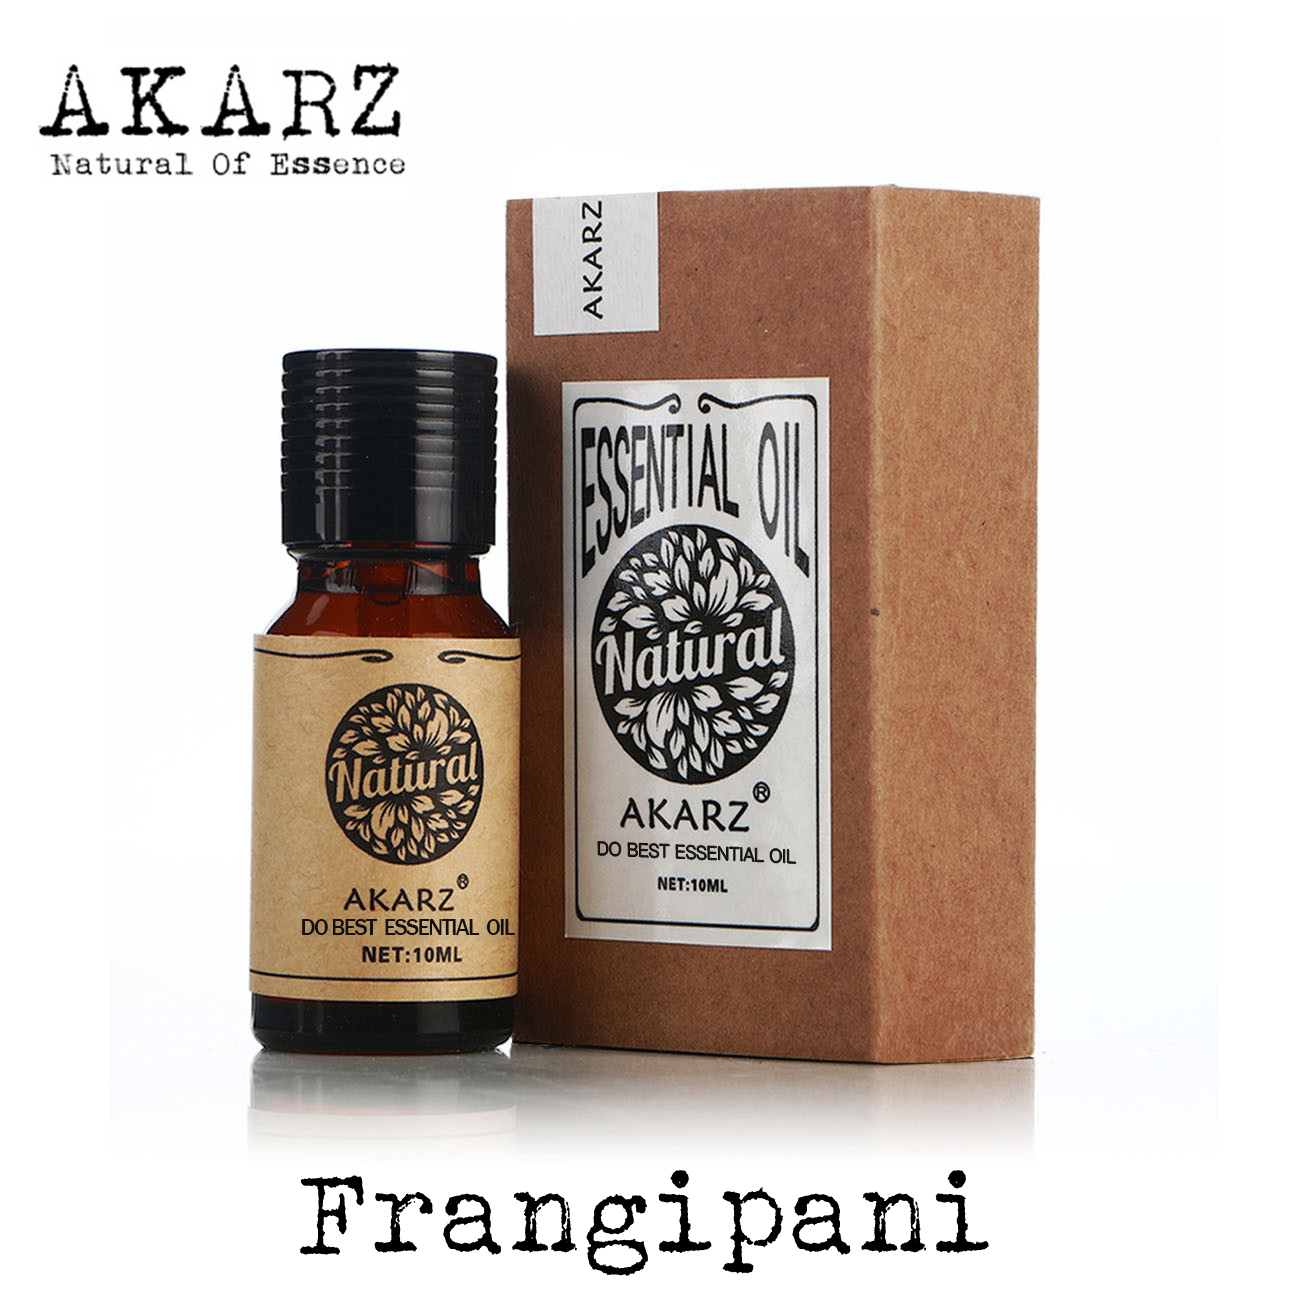 Frangipani essential oil AKARZ brand Oiliness Cosmetics Candle Soap Scents Making DIY odorant raw material Frangipani oil